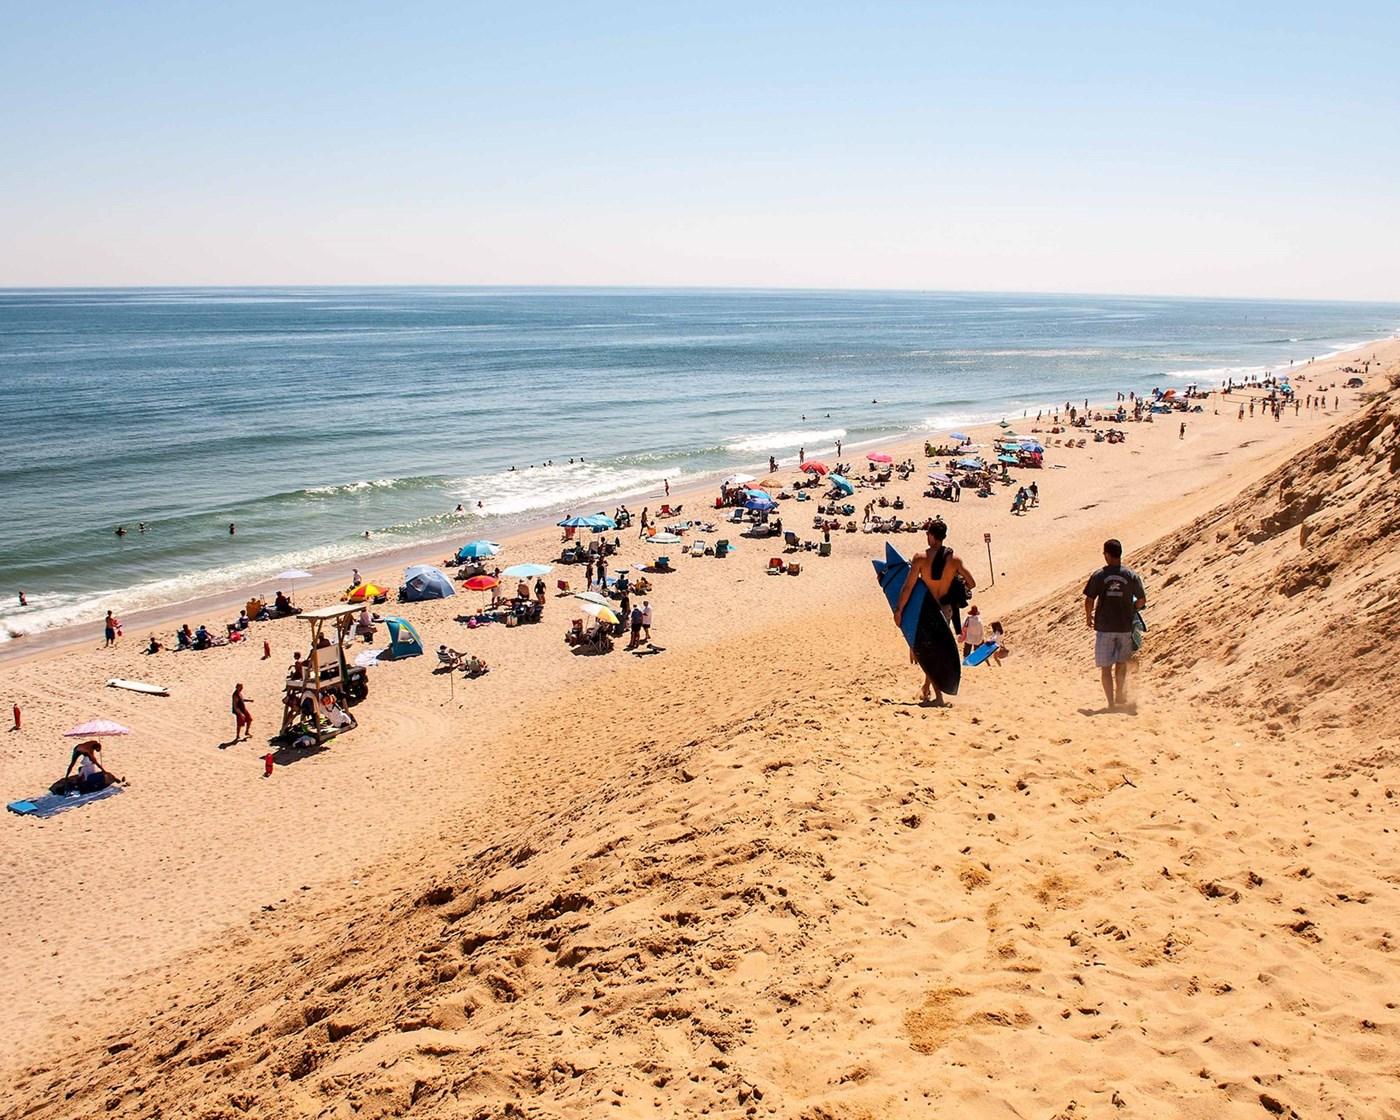 Wellfleet Vacation Rental home in Cape Cod MA, On beach